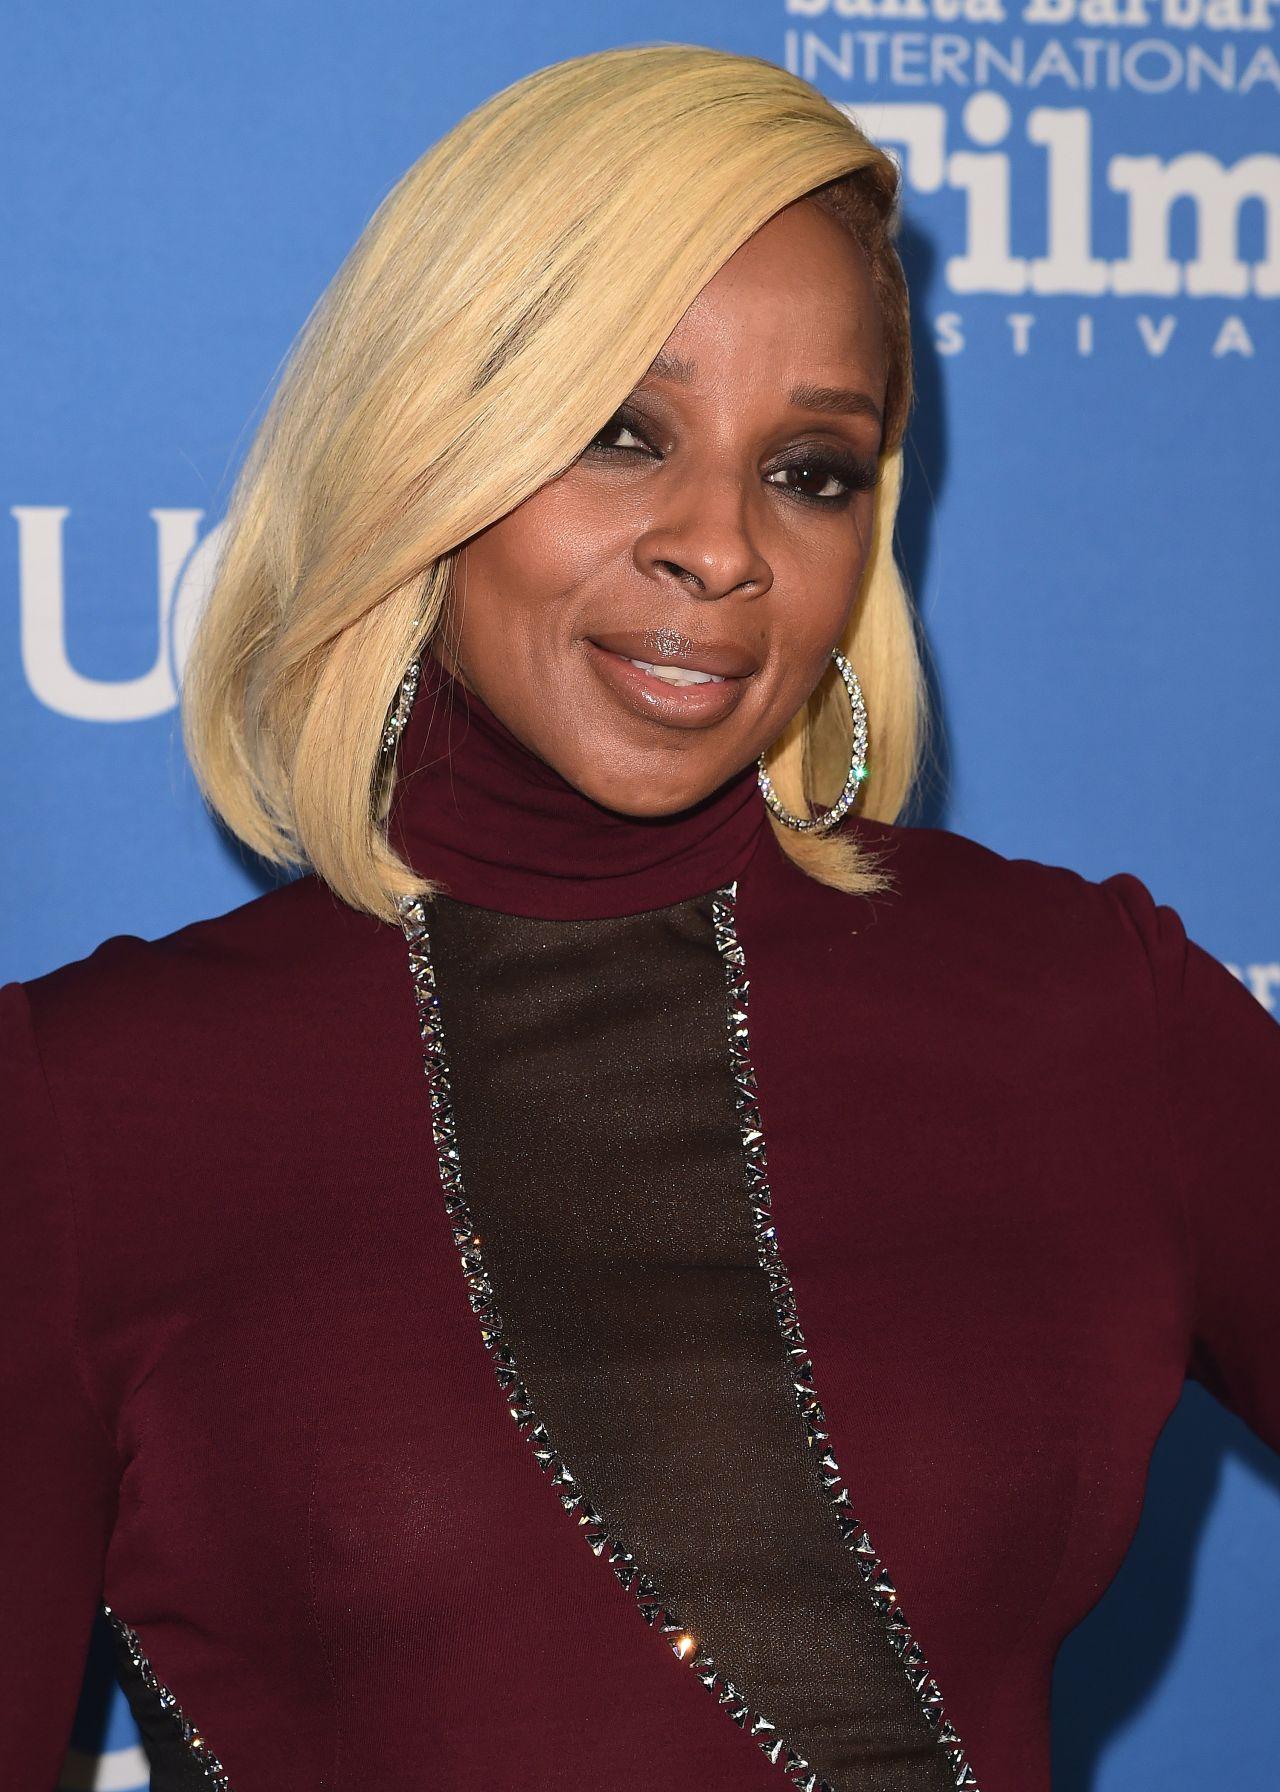 Mary J Blige 2018 Santa Barbara International Festival